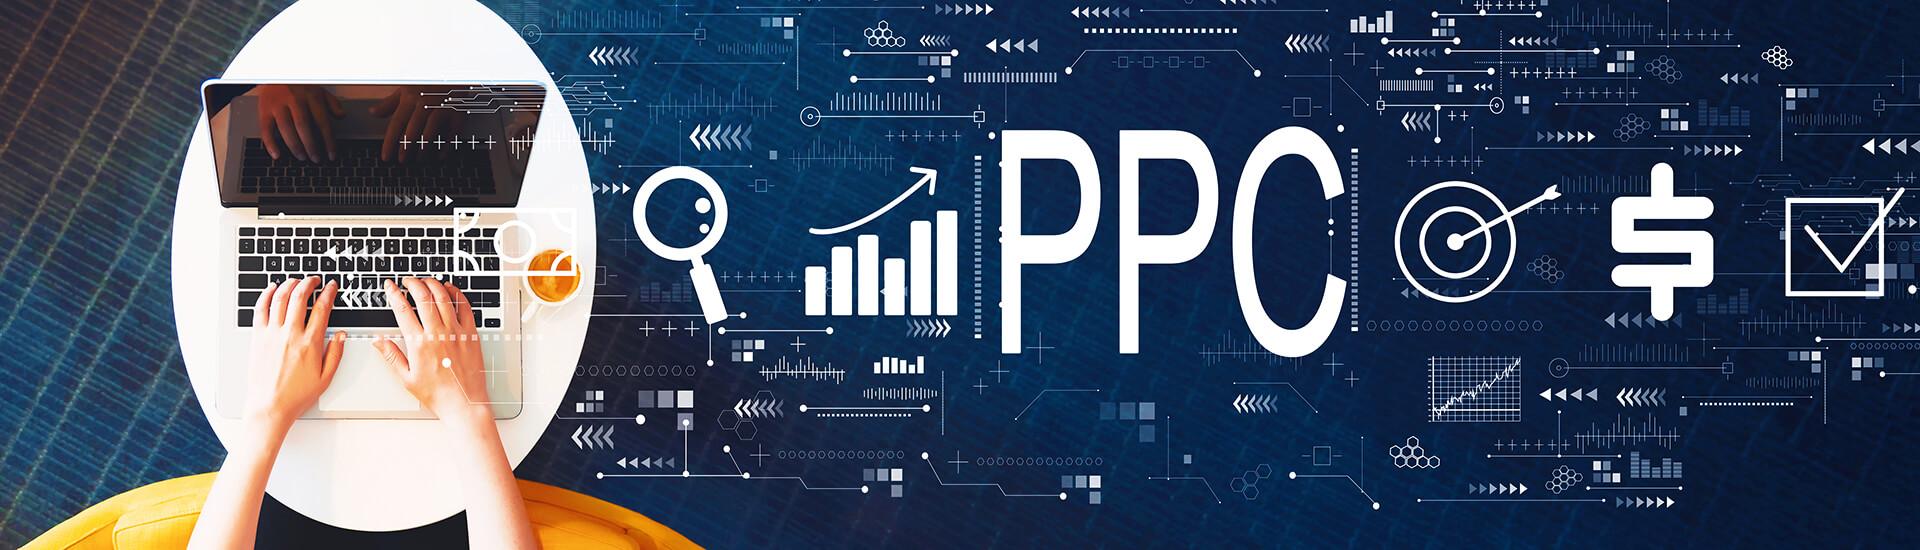 Web Service - PPC - 1